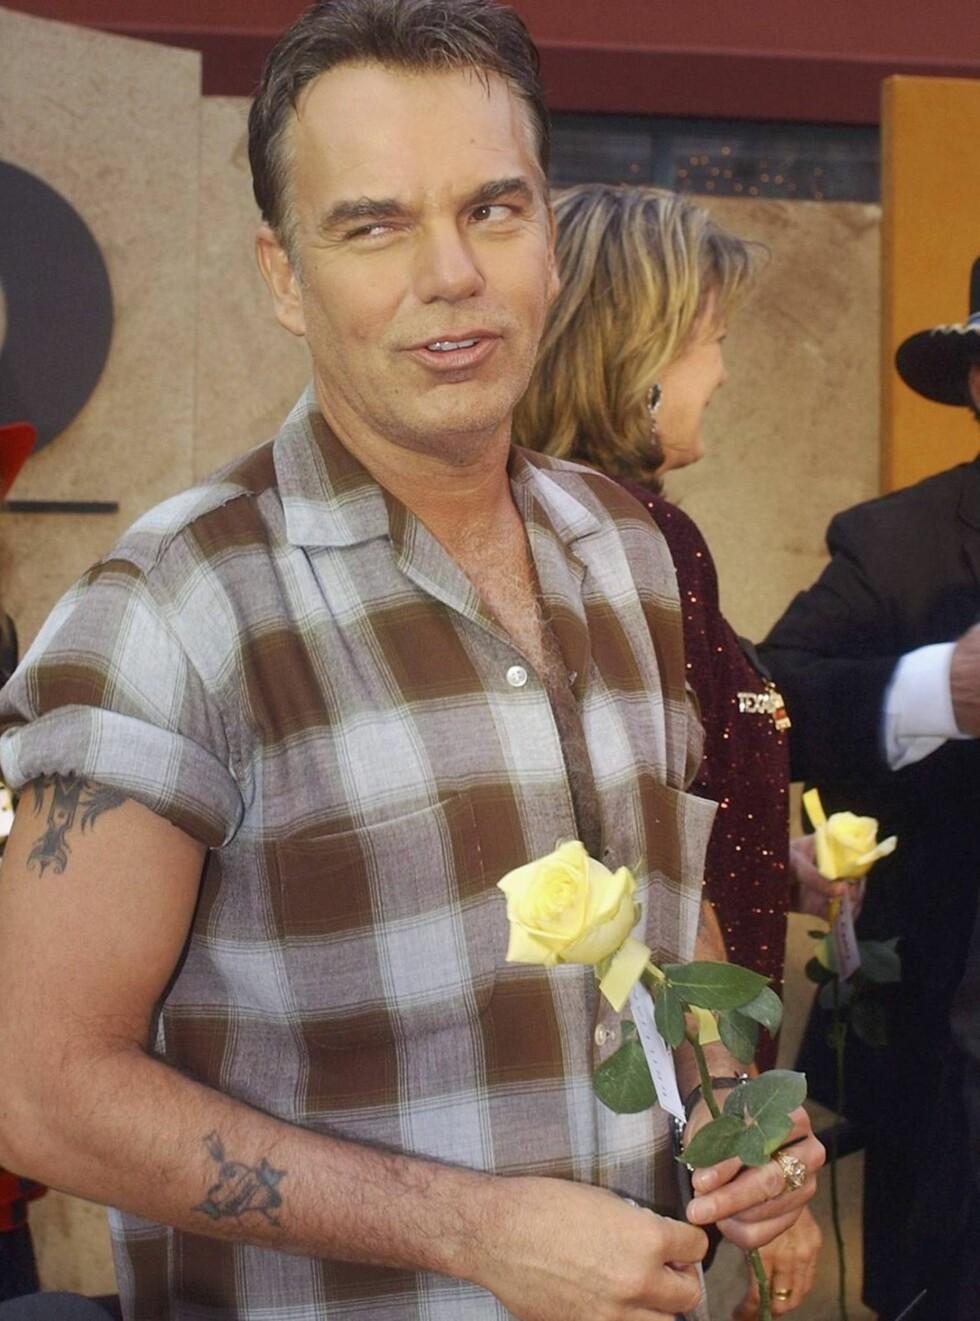 SKEPTISK: Billy Bob er ikke den slipsbærende typen... Foto: All Over Press